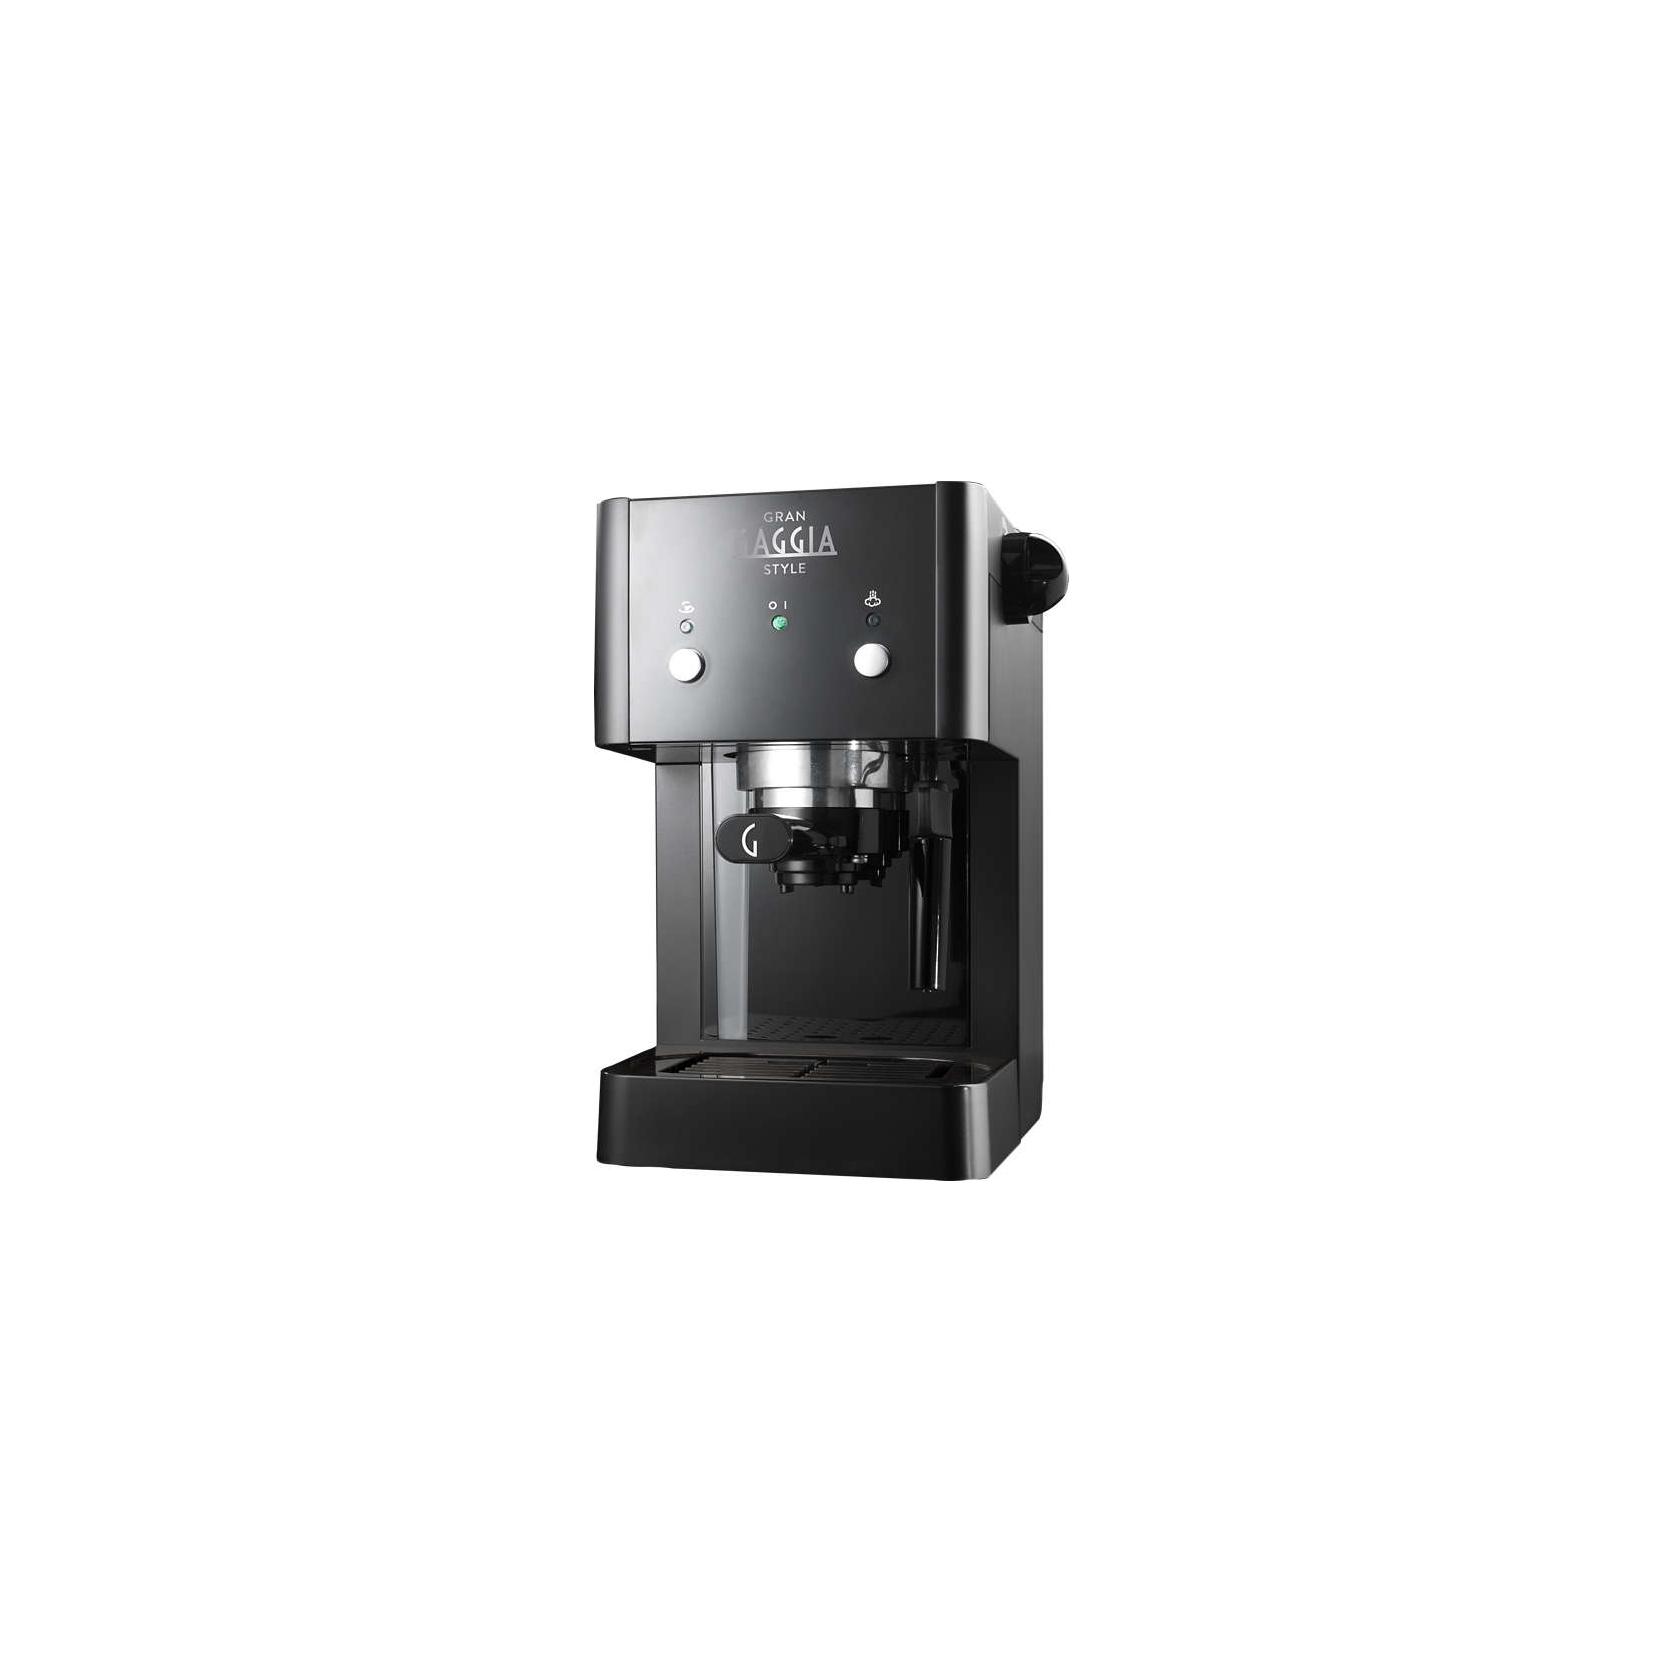 MACCHINA DA CAFFE GRANGAGGIA RI842311 STYLE BLACK